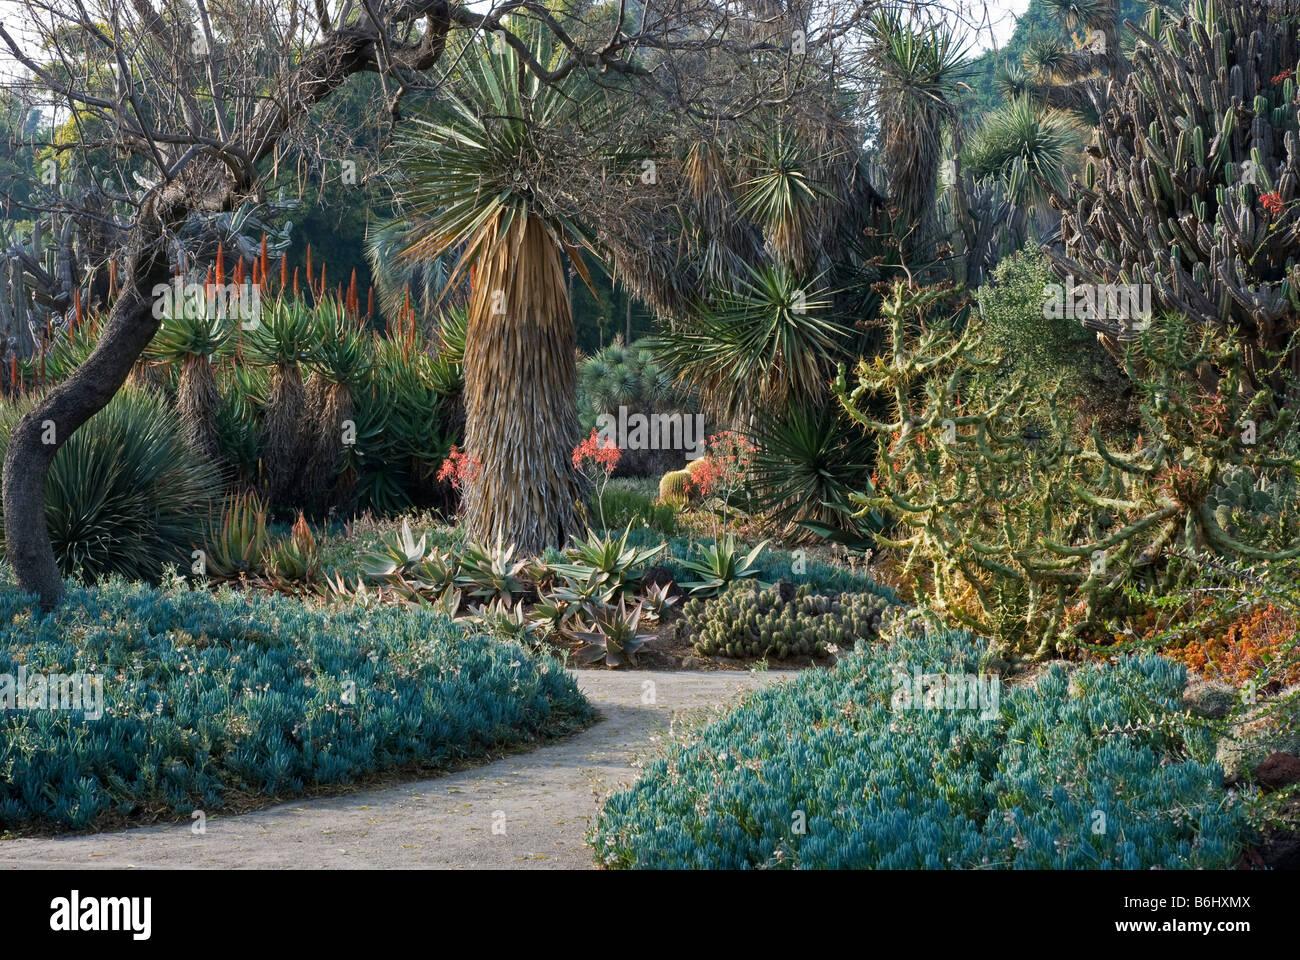 At The Huntington Botanical Gardens, Santa Monica, USA   Stock